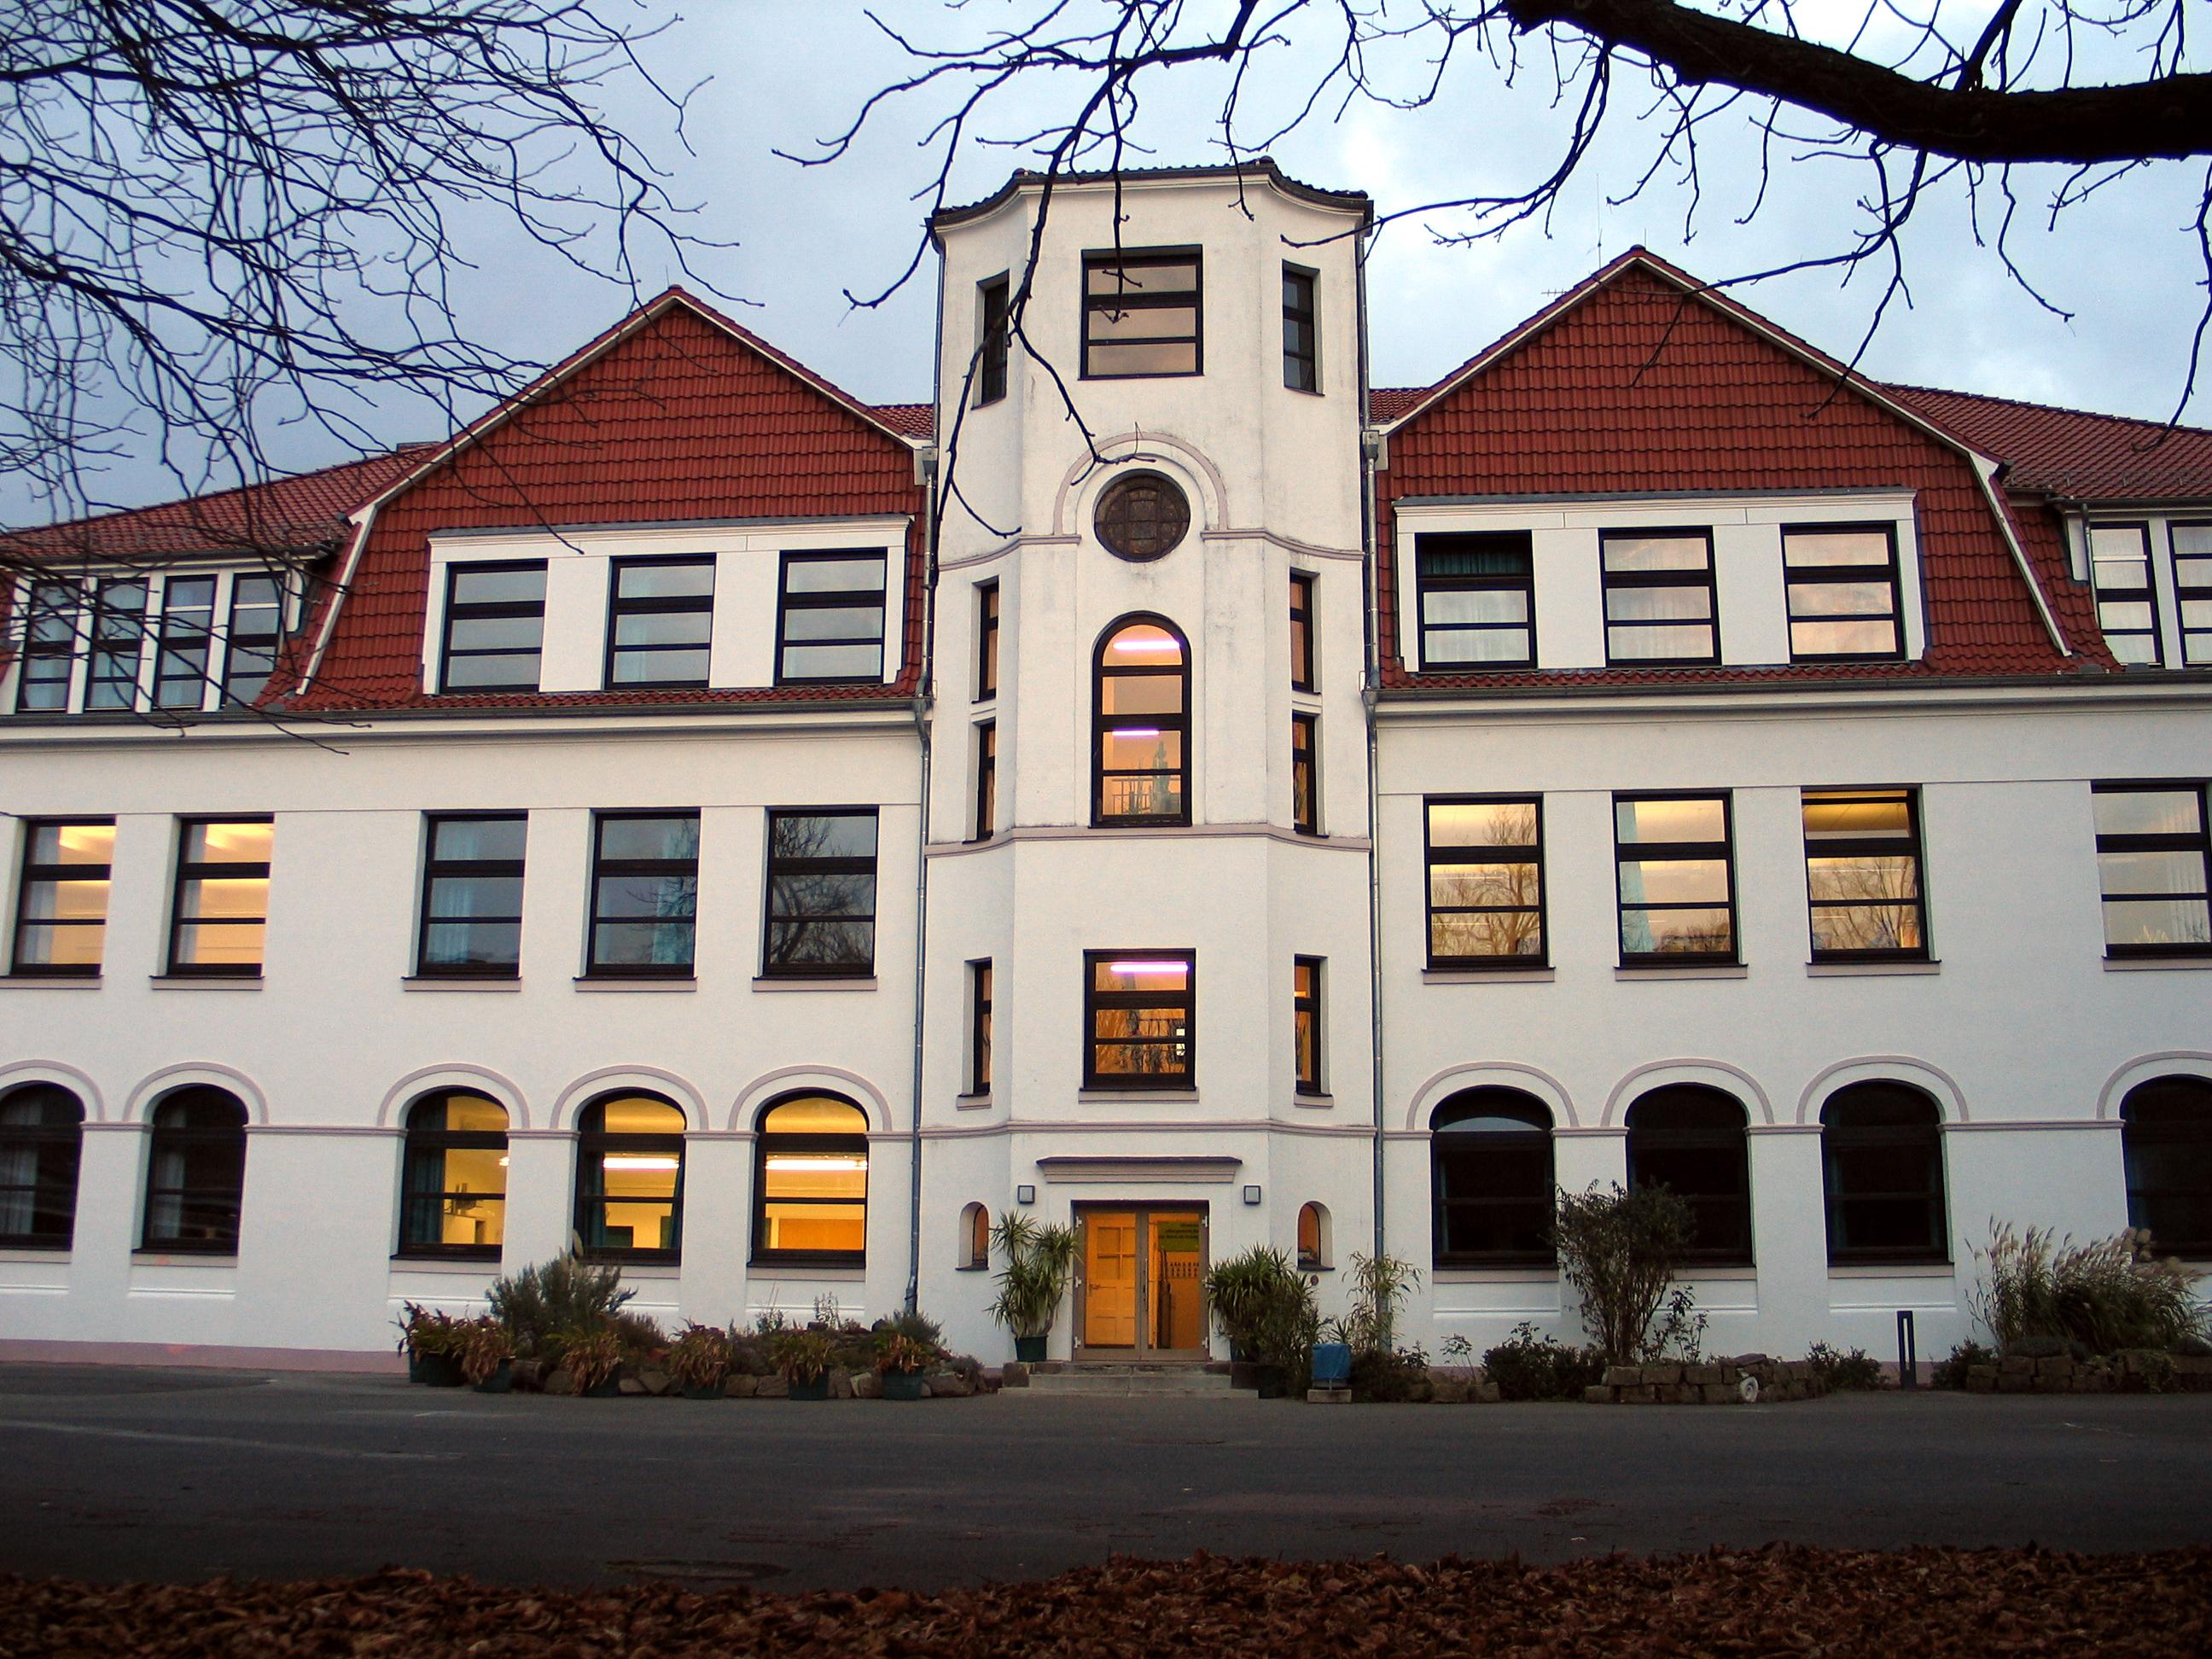 file hannover kolleg gymnasium f r erwachsene in hannover institut zur erlangung der. Black Bedroom Furniture Sets. Home Design Ideas